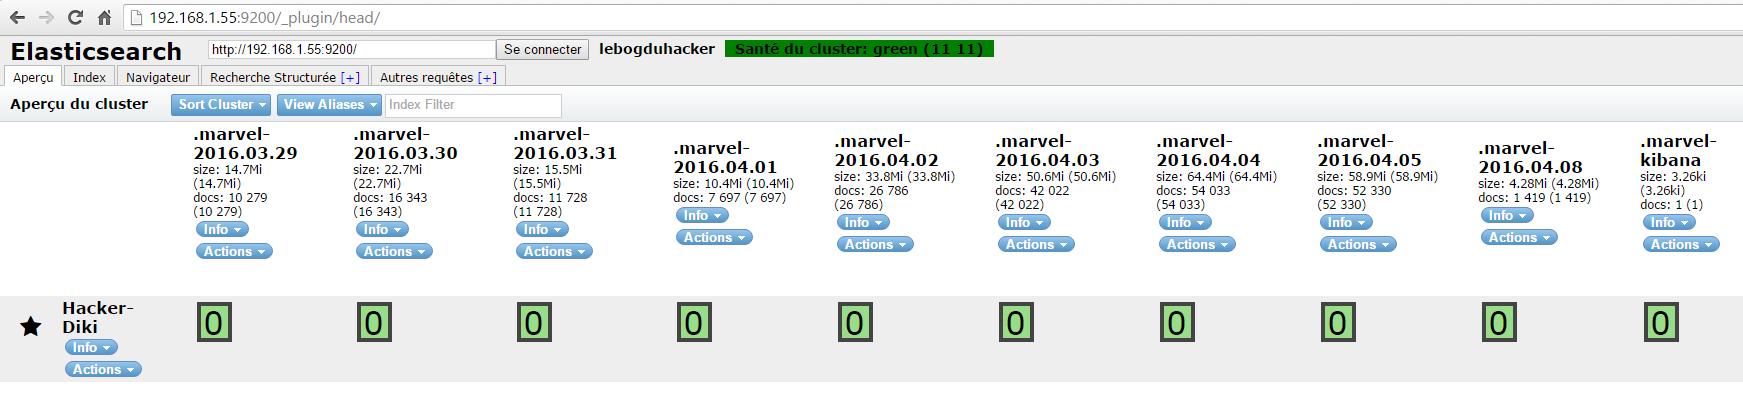 Installation 100 commande curl retour shards et index non assignés cluster jaune